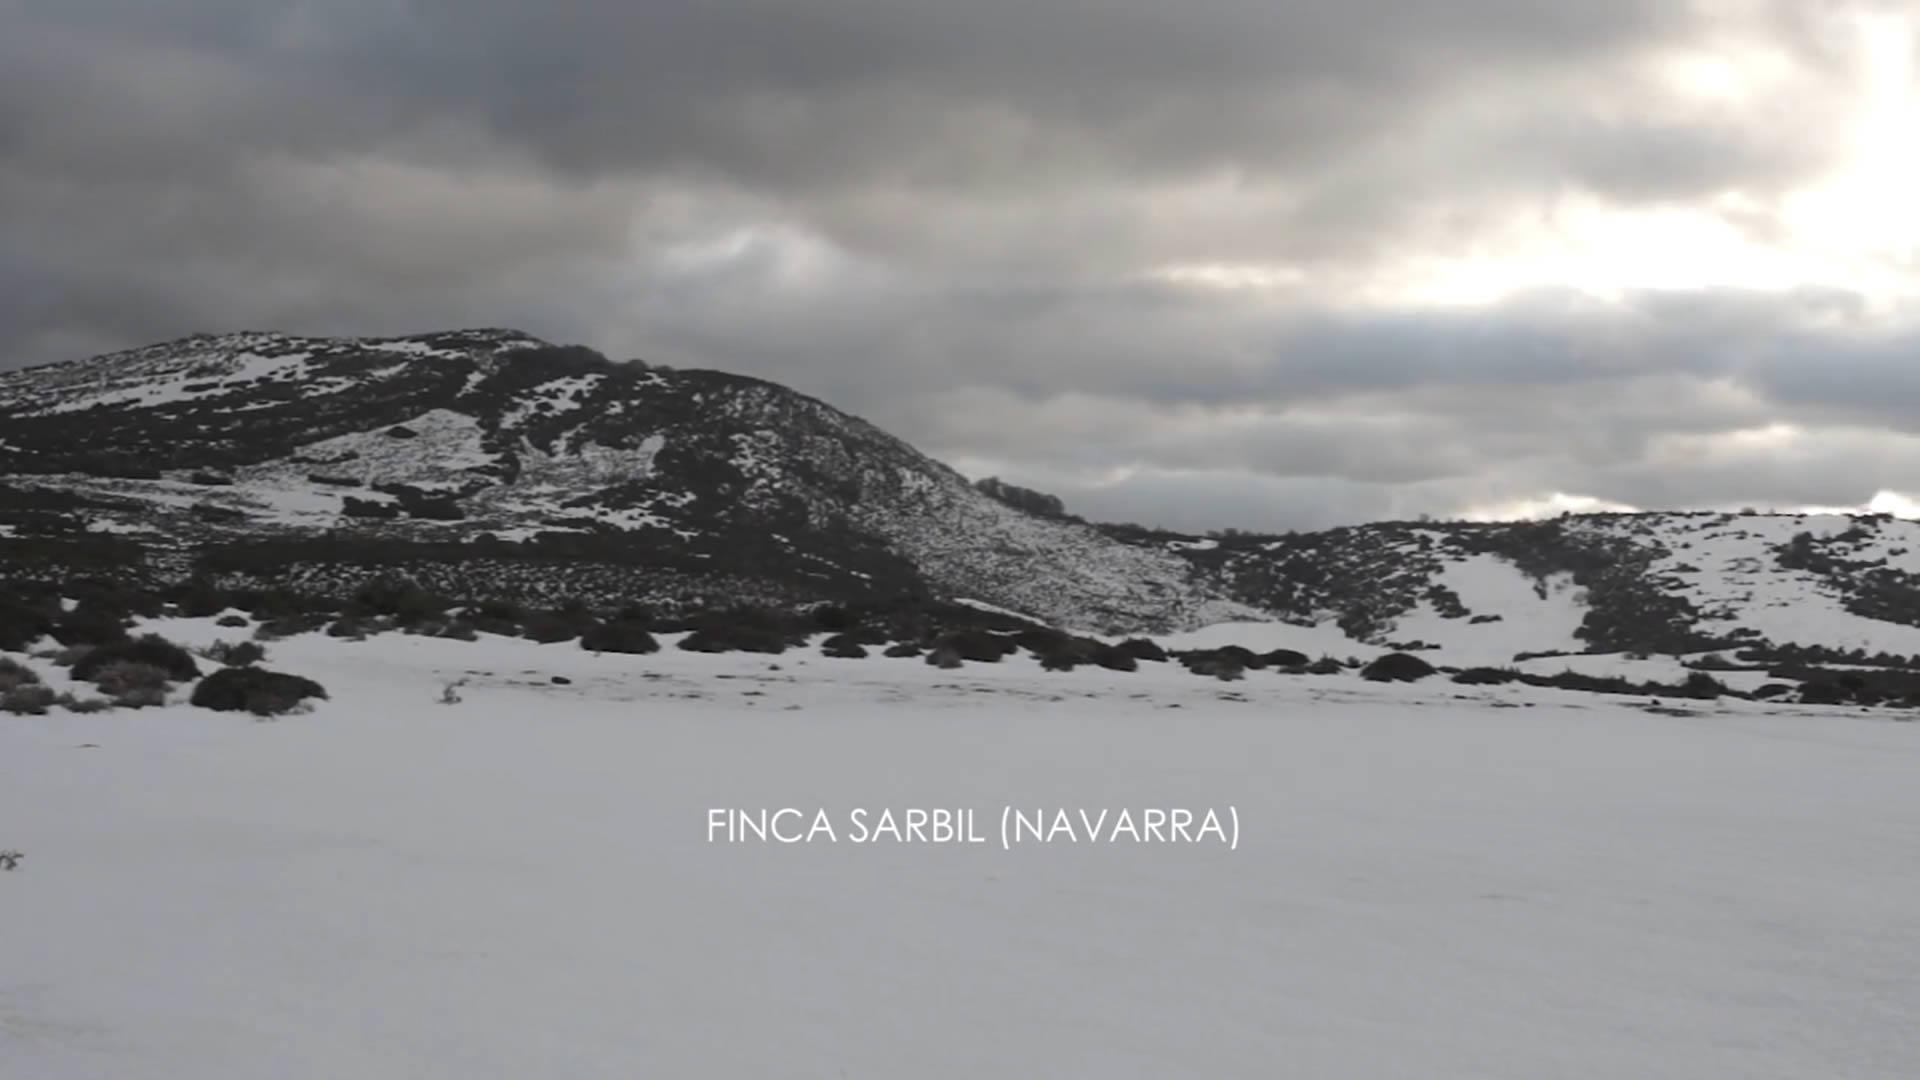 finca-sarbil-turismo-rural-navarra-tierrasdeiranzu.mp4